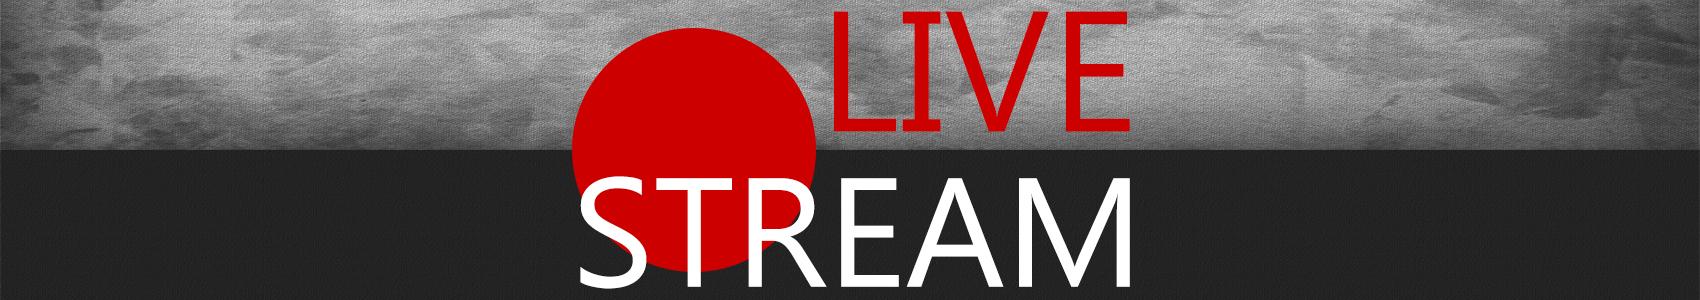 Live Stream Page Header